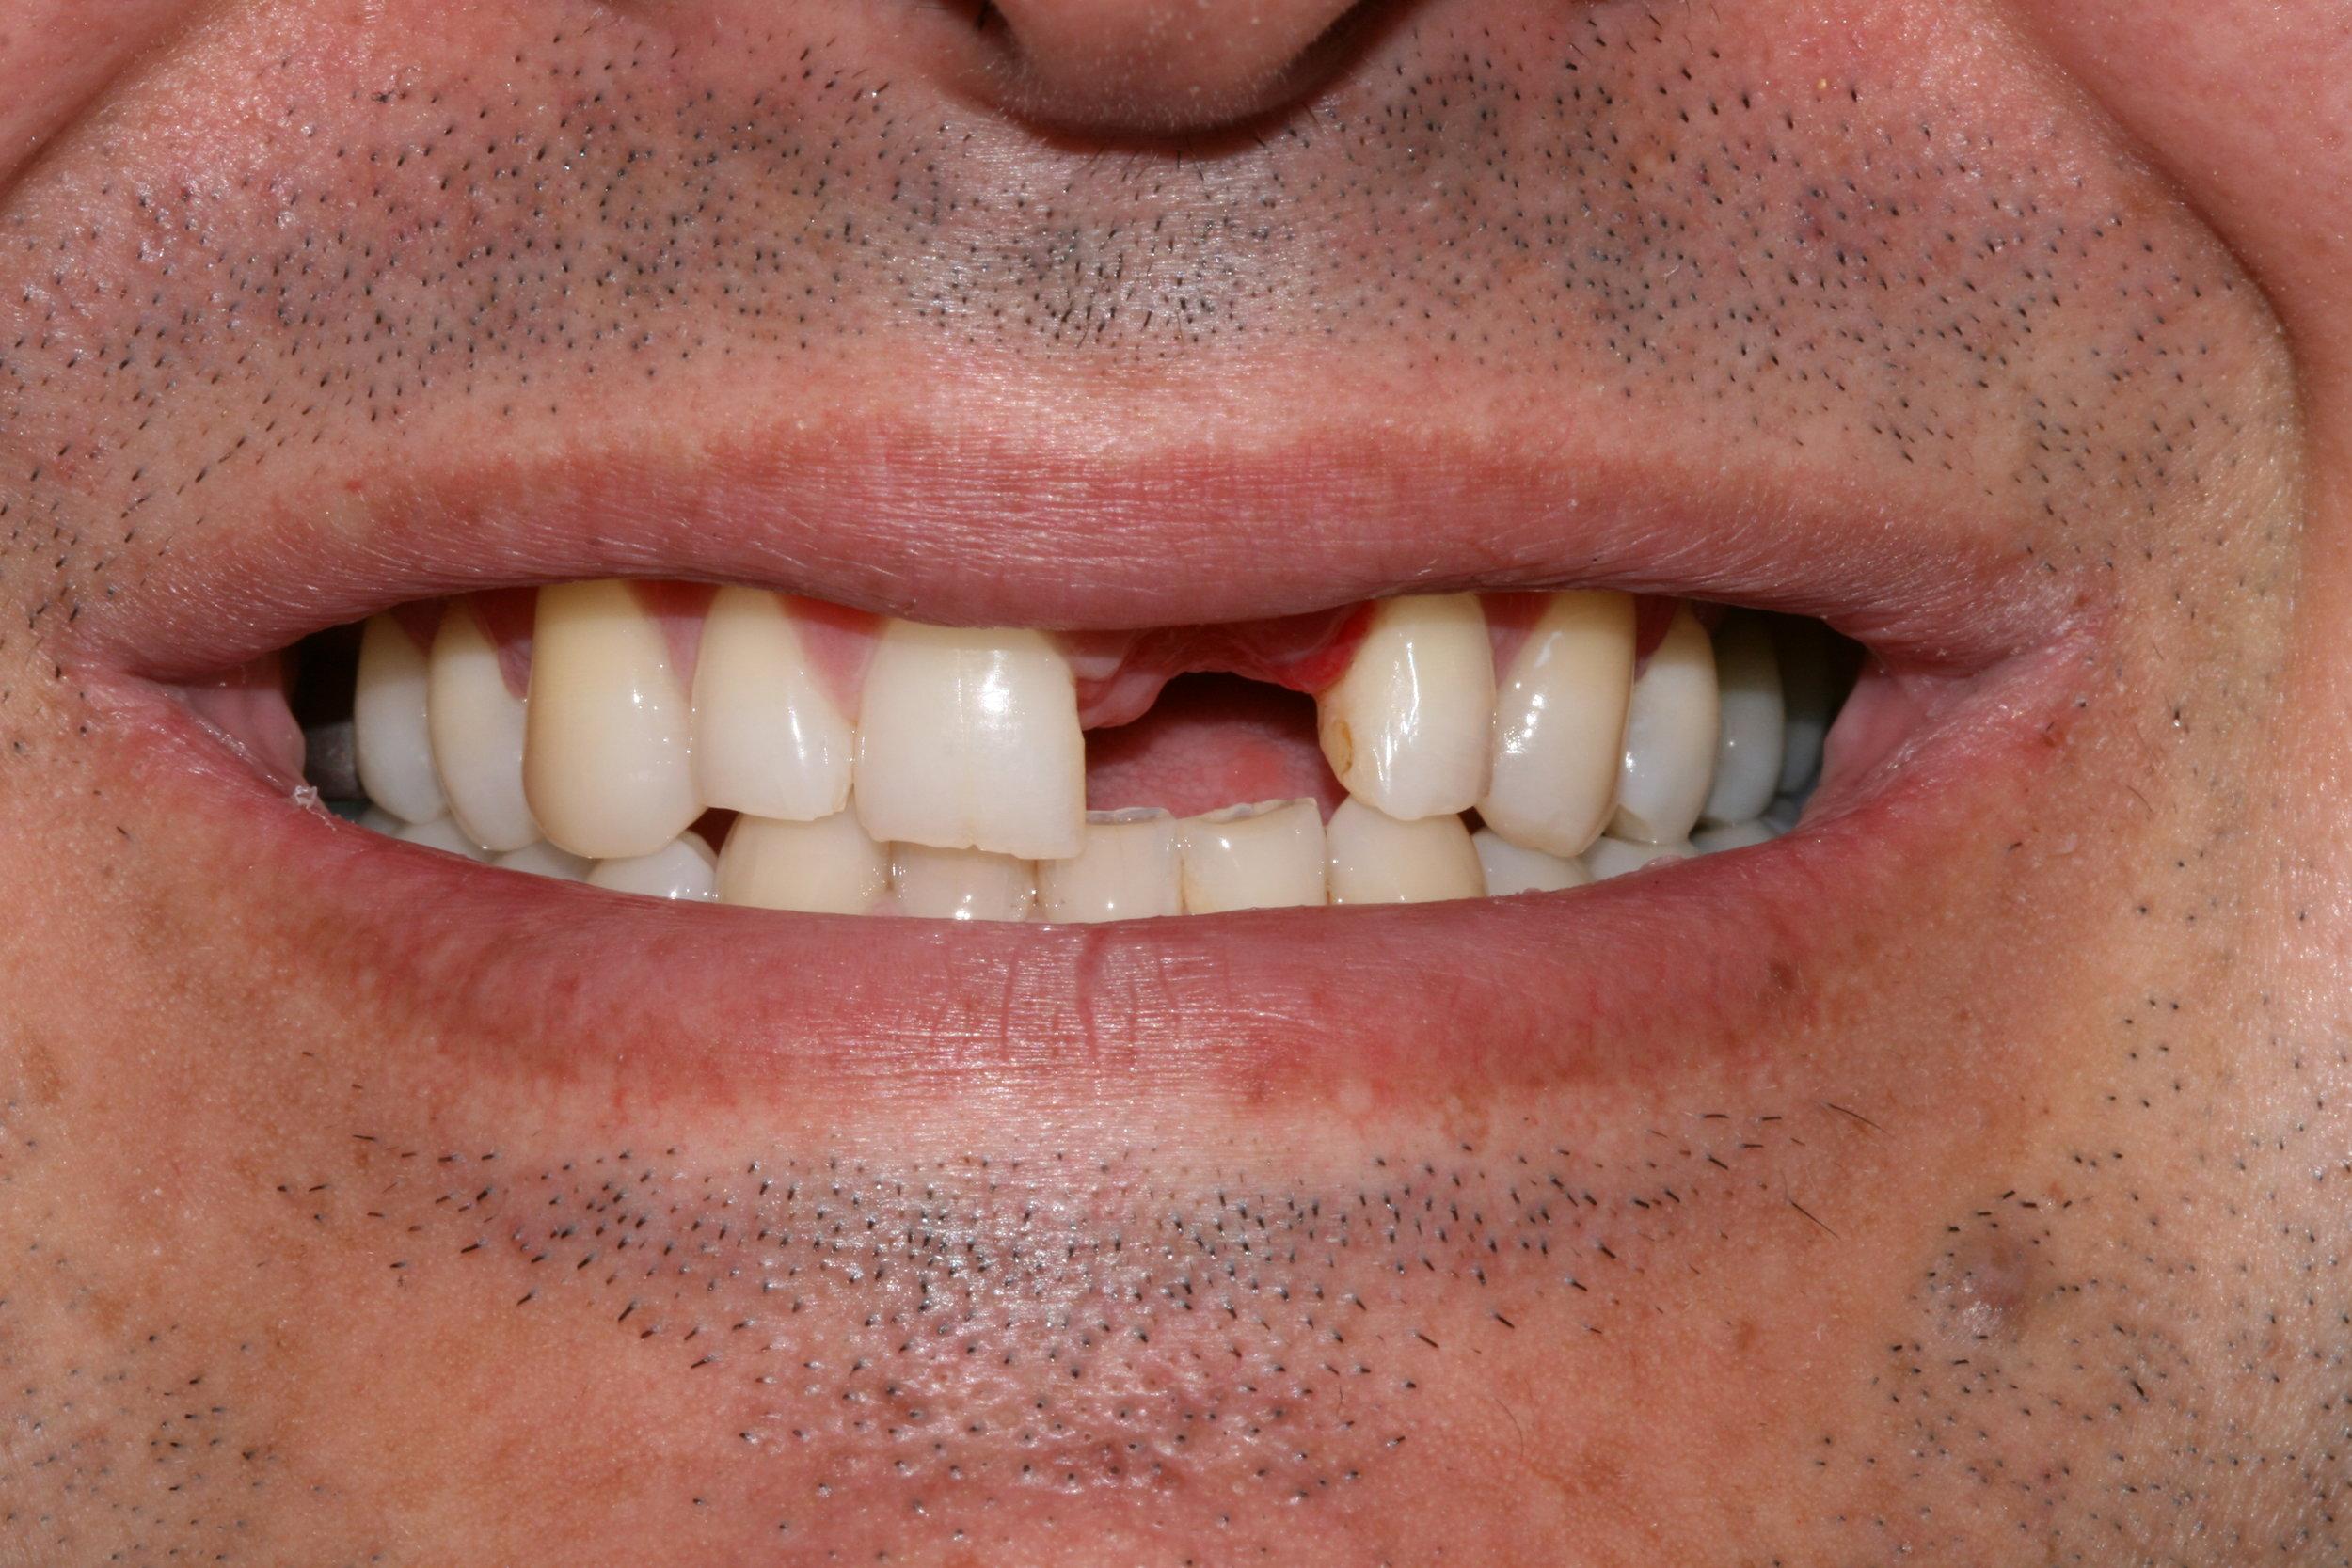 Dental Implant - BEFORE